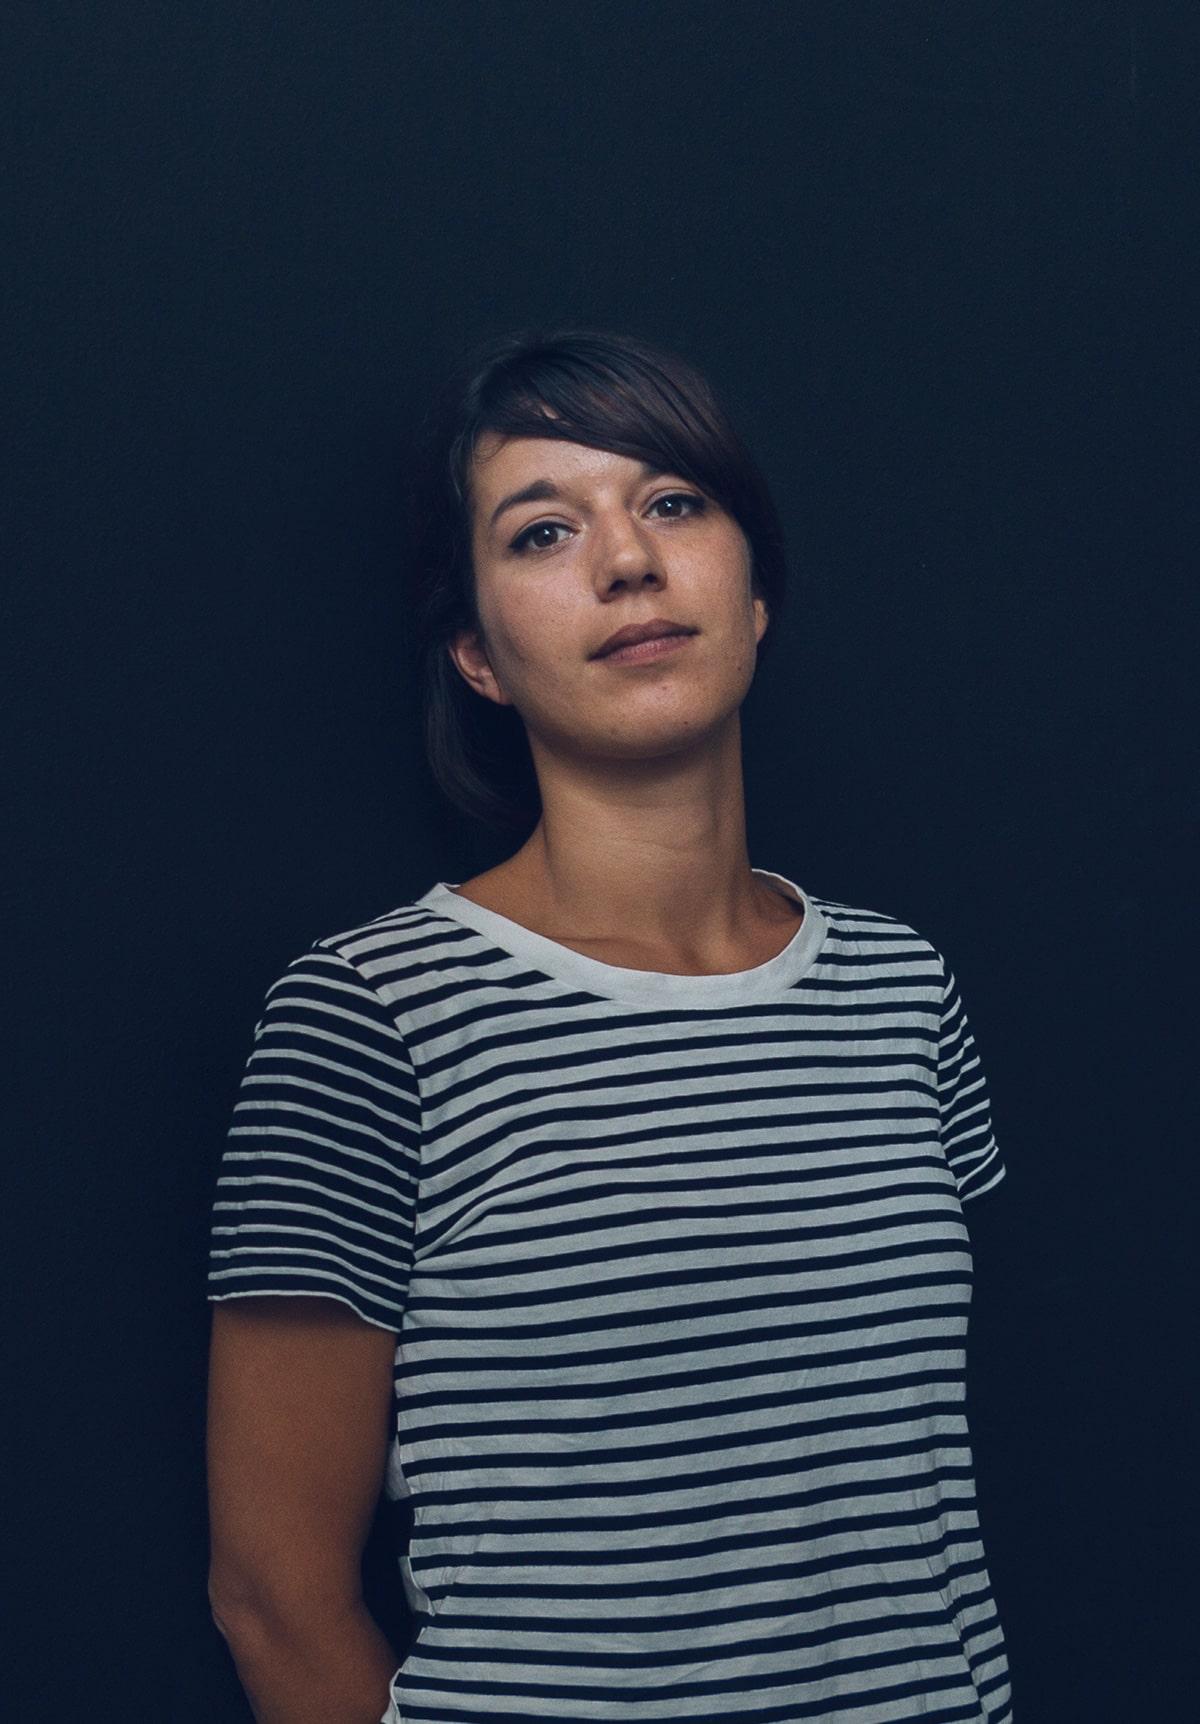 Marie Dufay